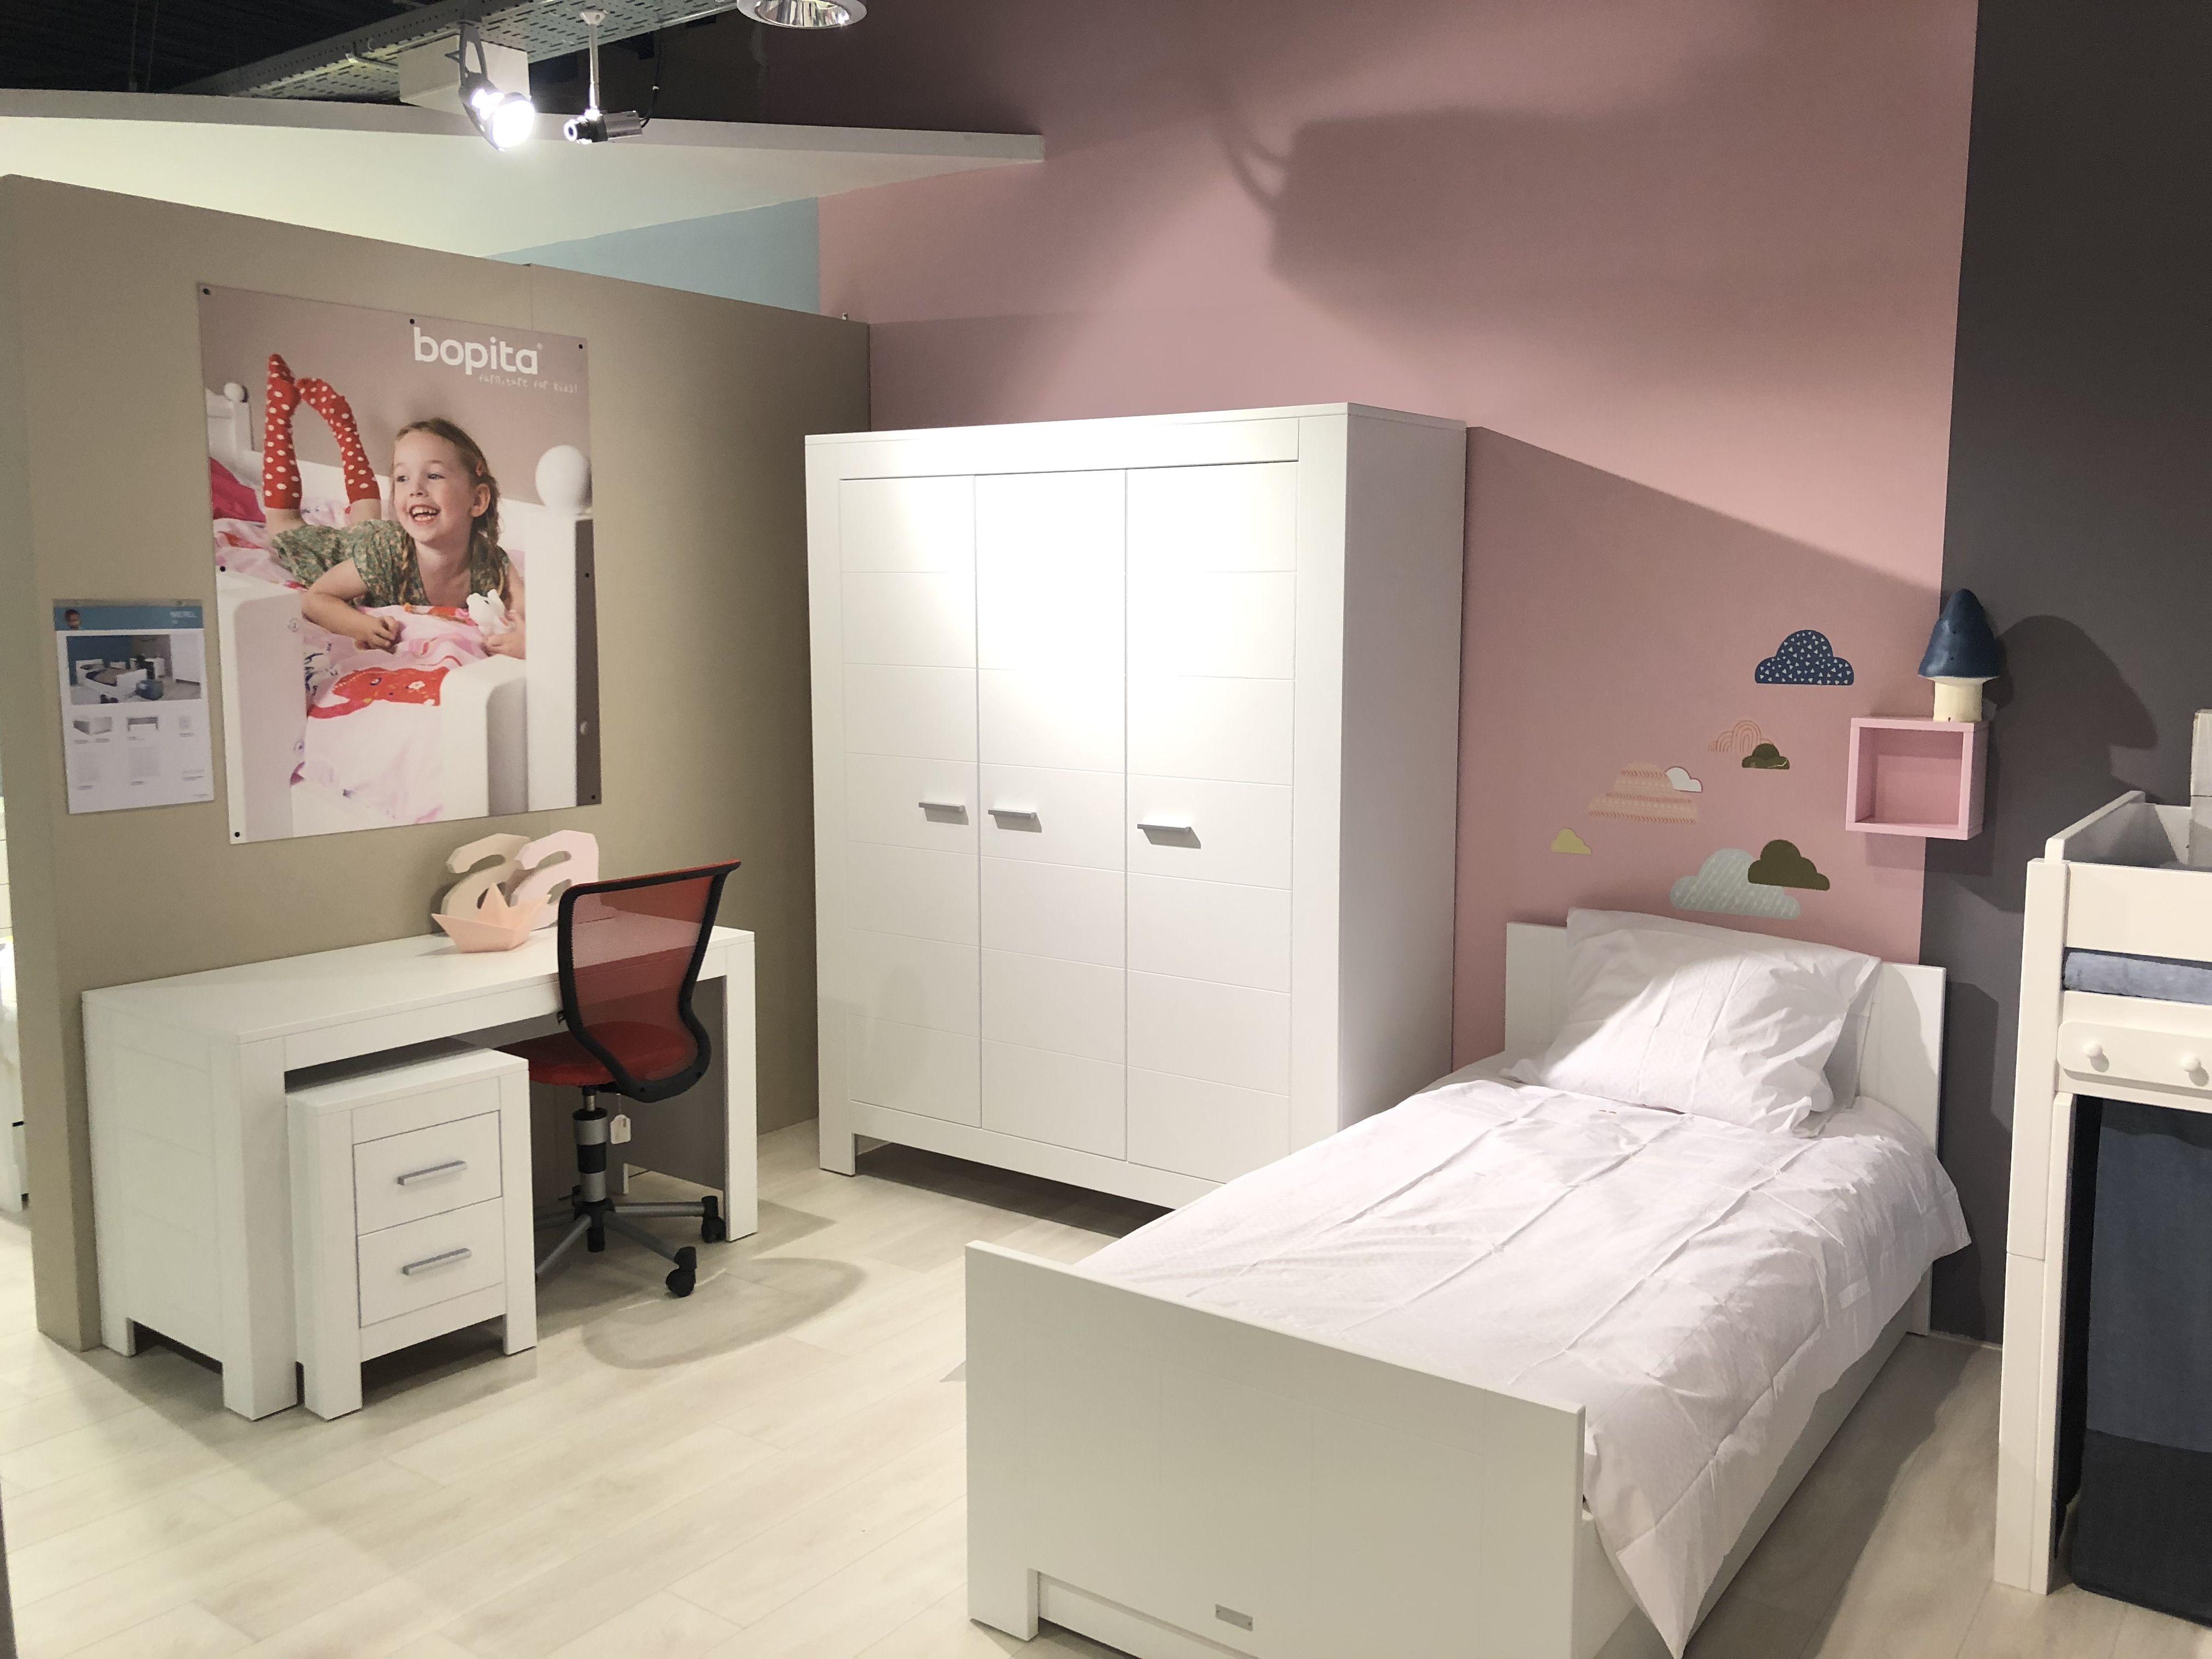 Babykamer Bopita Ideeen : Kinderkamer merel van bopita de boomhut bopita